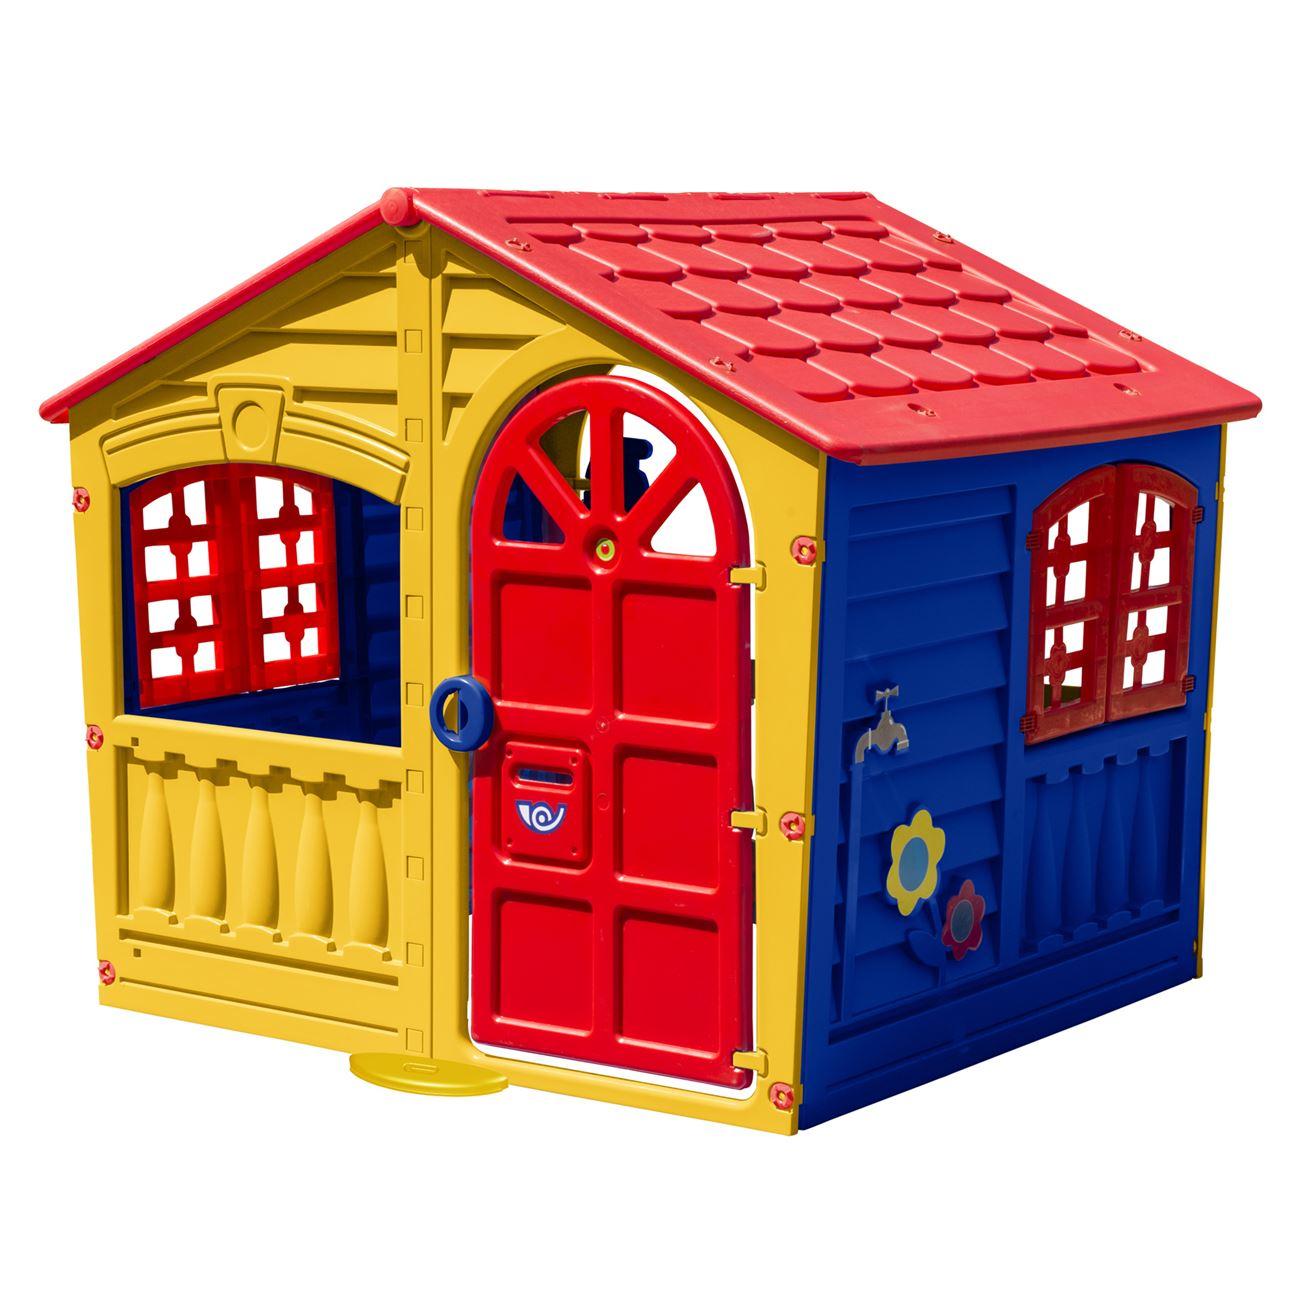 91a36924387a Σπίτι House of Fun PALPLAY 140x109x115   Σπιτάκια Διάφορα